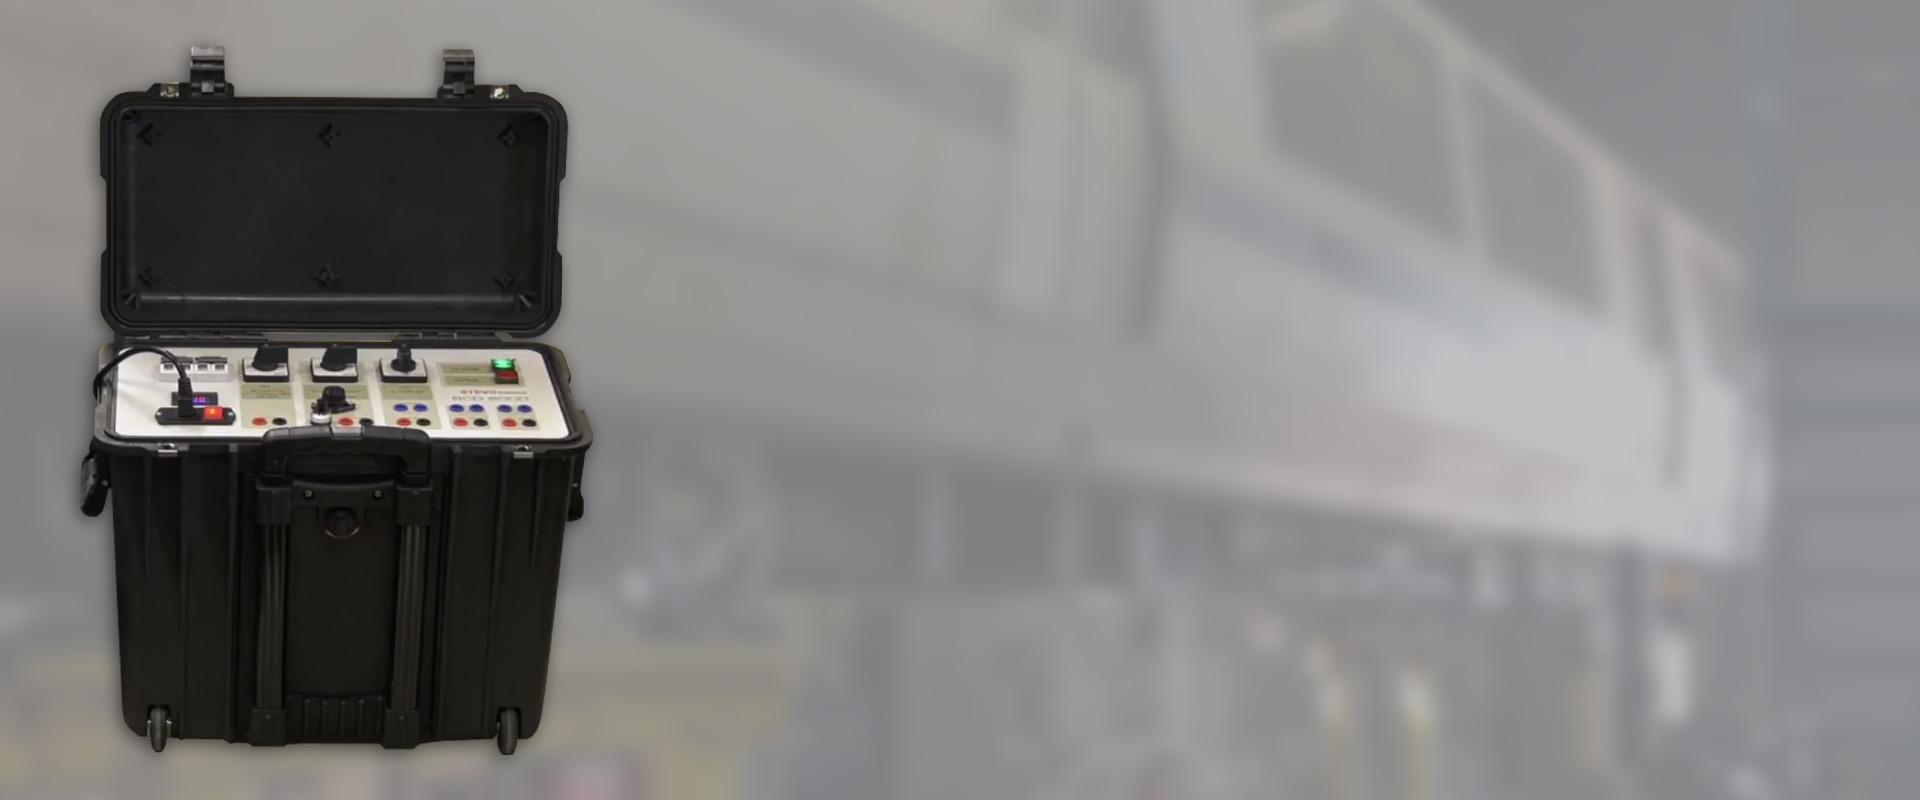 Breaker Control Drive (BCD)